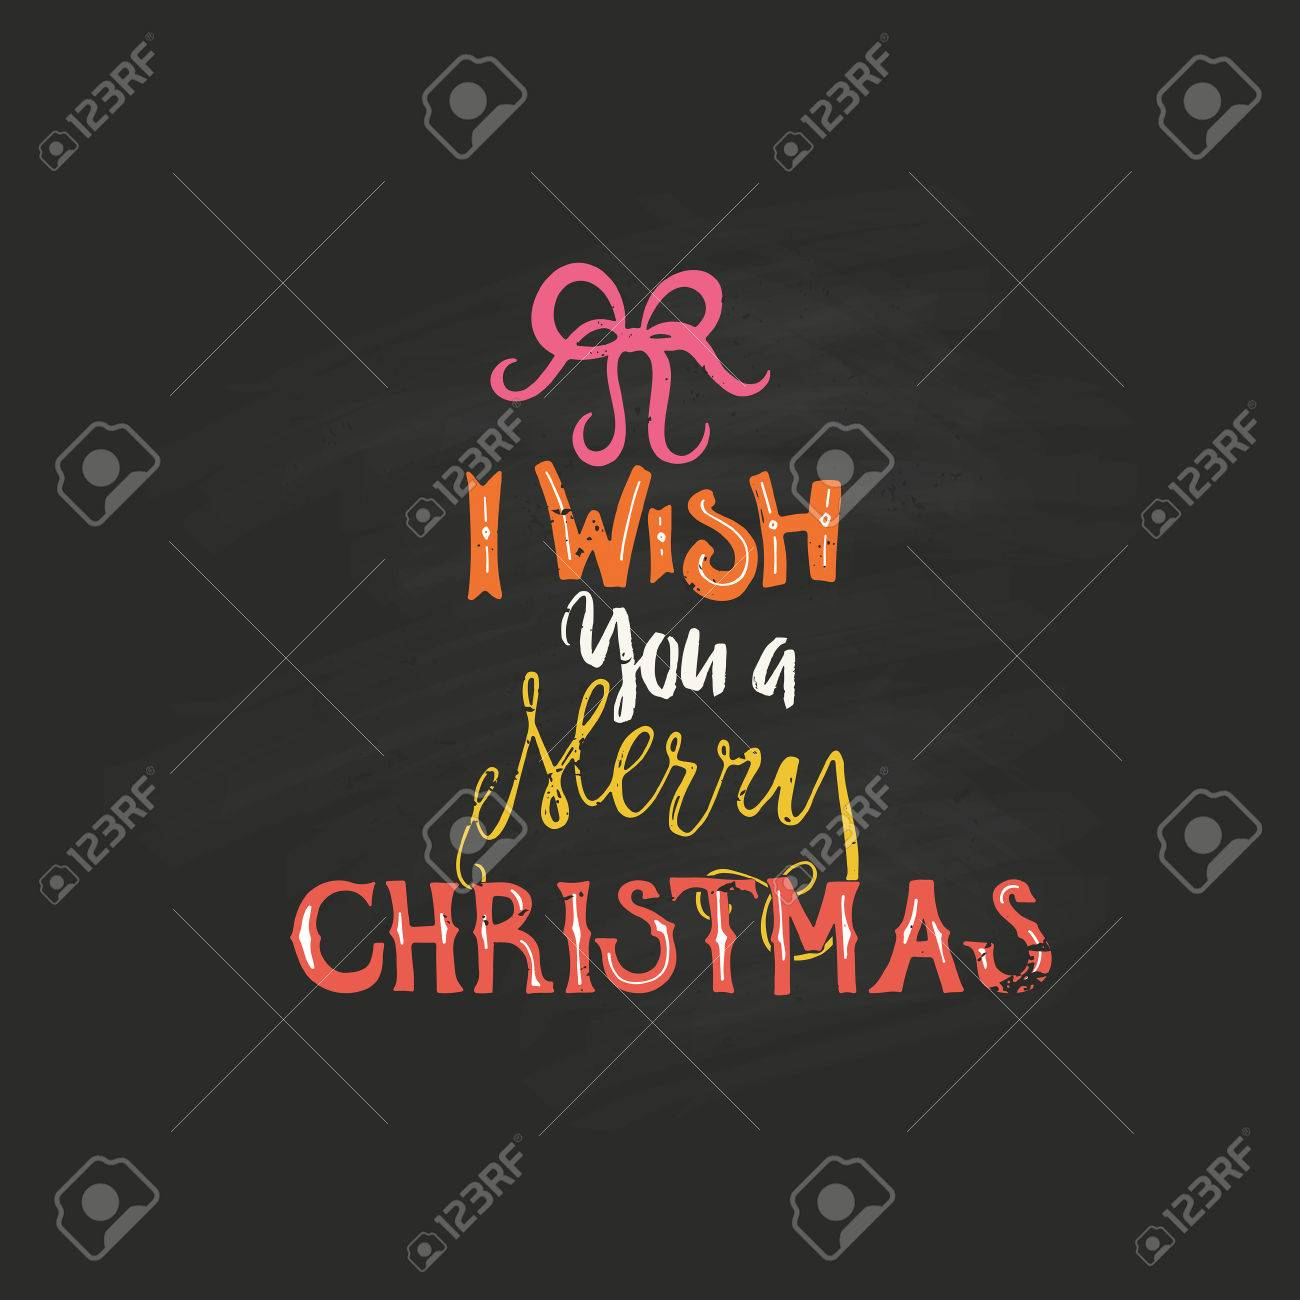 Weihnachtskarten Beschriften.Stock Photo